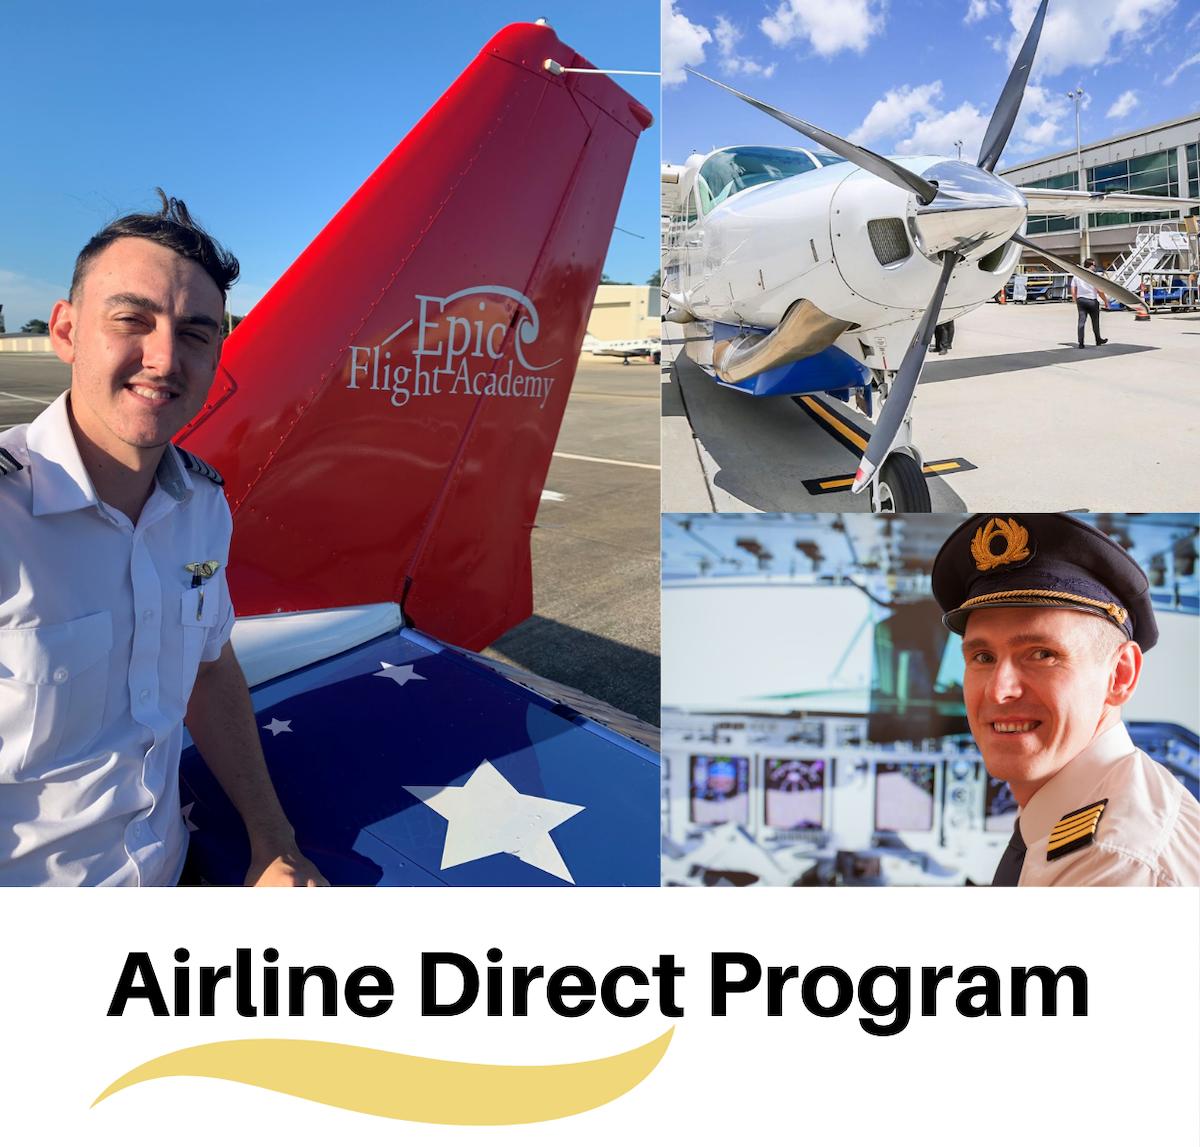 New Airline Direct Program